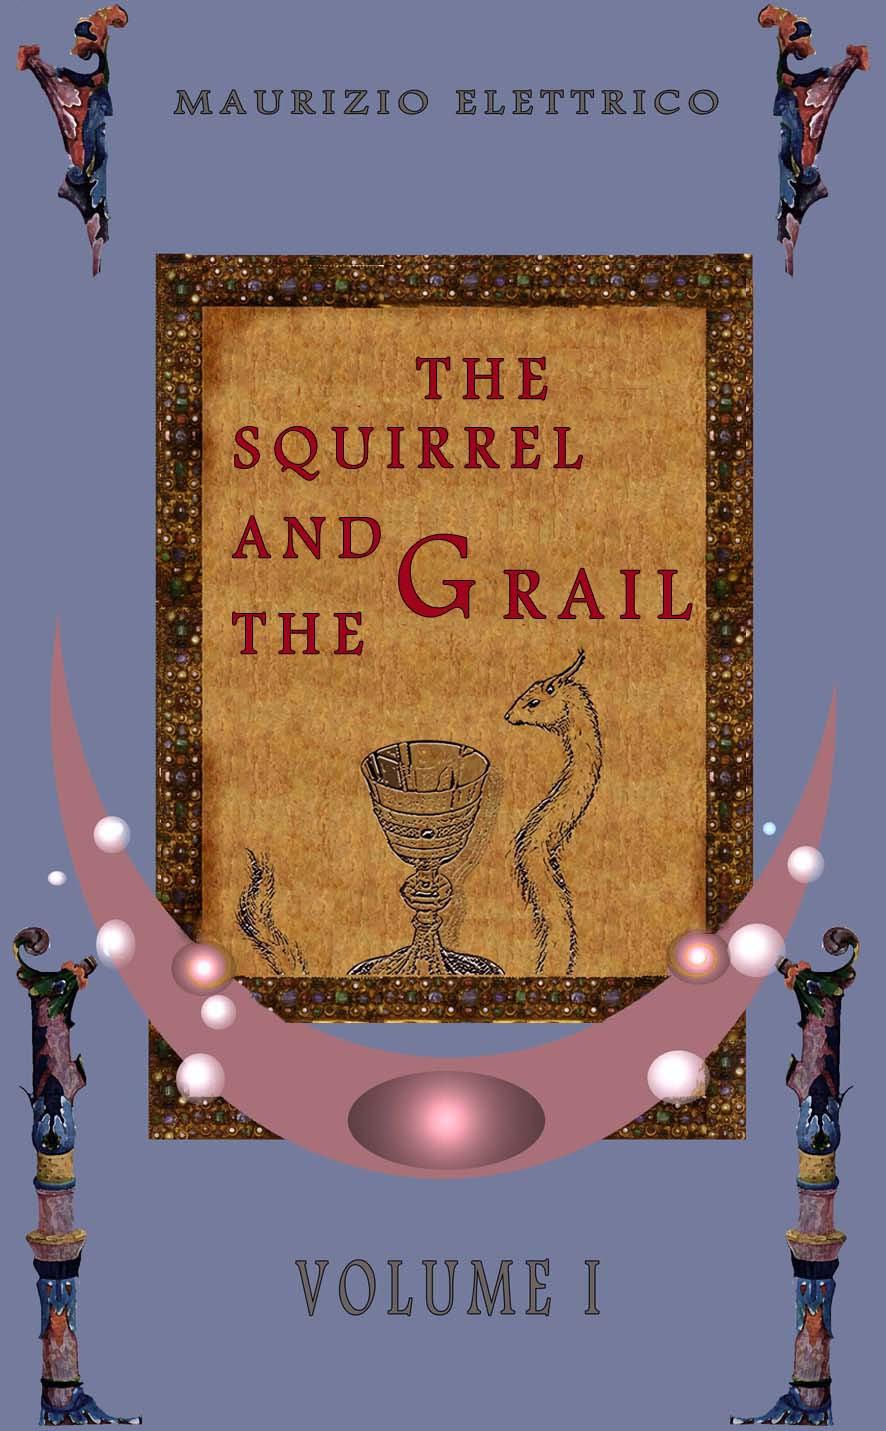 The squirrel and the Grail, Maurizio Elettrico, fantasy book, science fiction, saghe, epic fantasy, erotic fantasy, cyborg